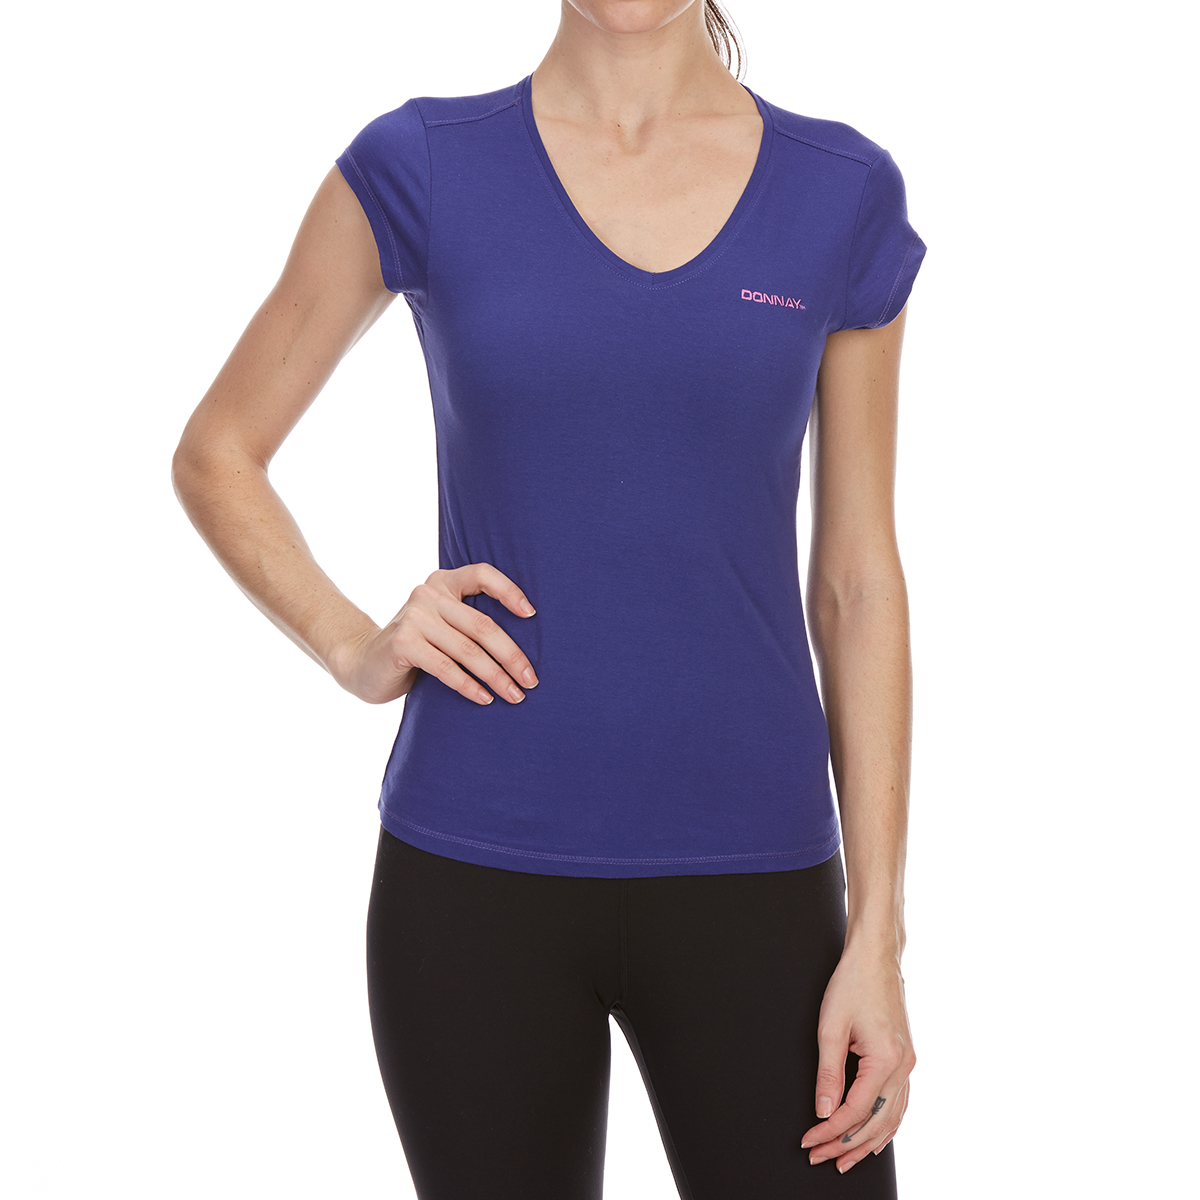 Donnay Women's V-Neck Short-Sleeve Tee - Blue, 10